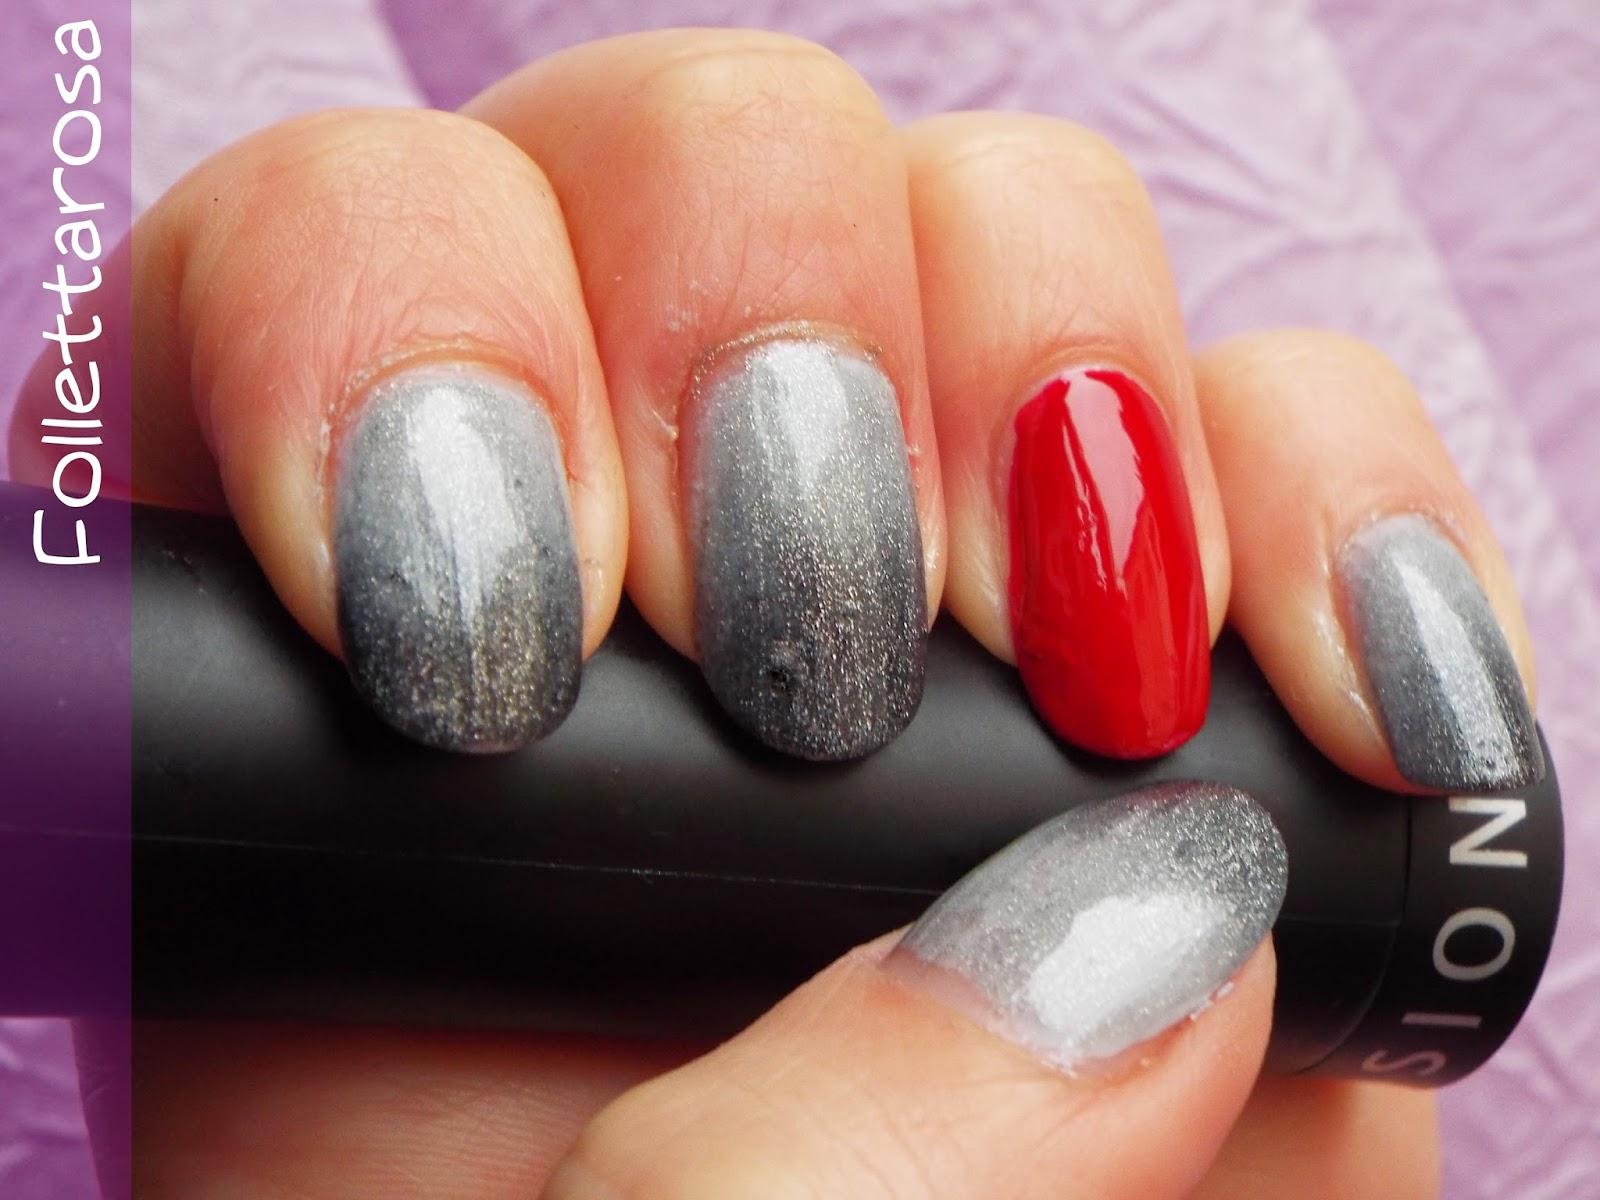 50 sfumature di grigio nail art film